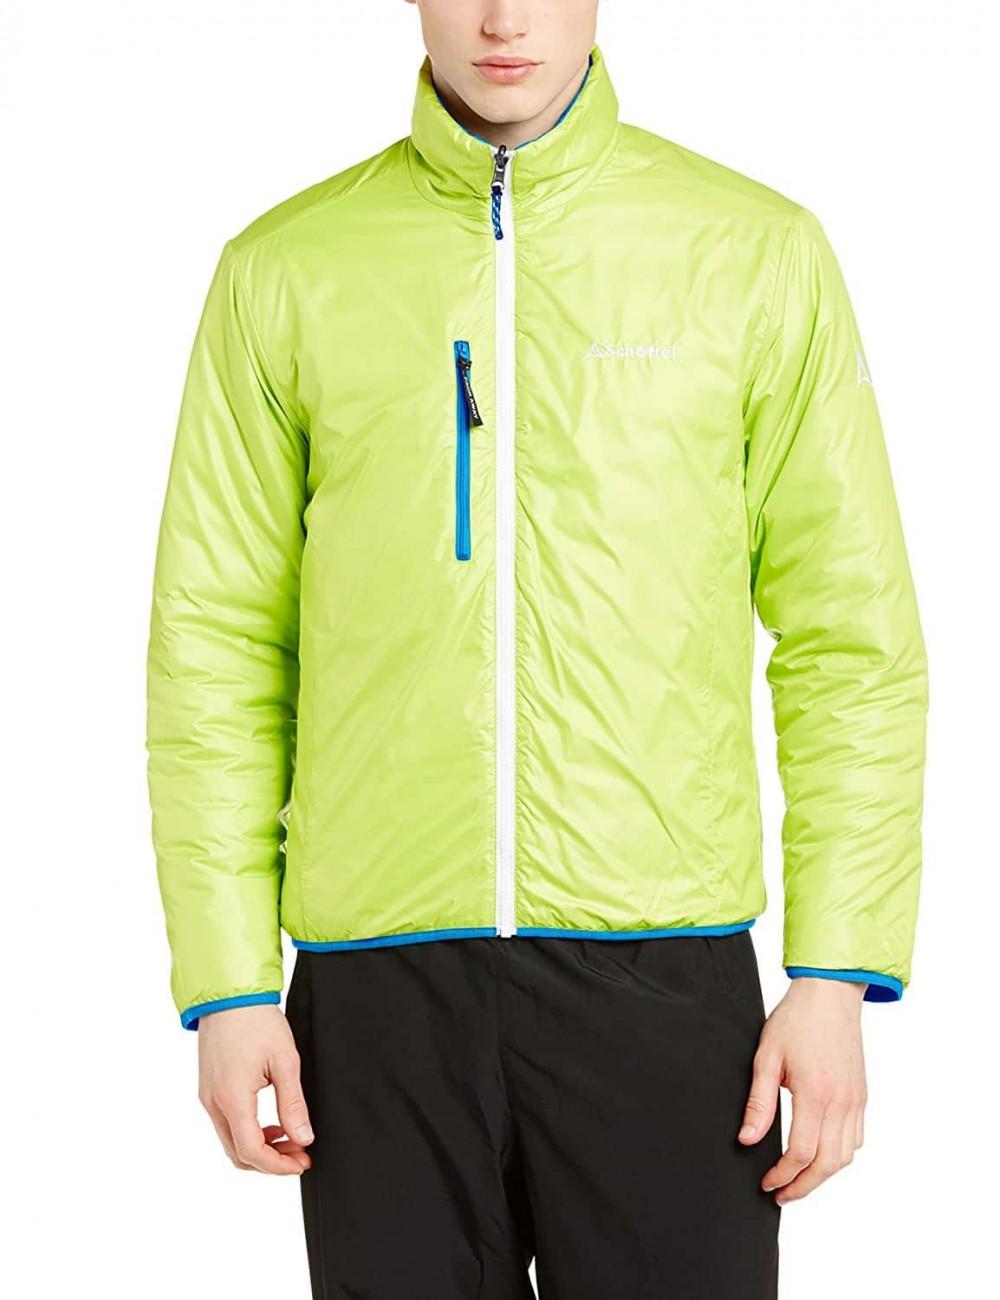 Куртка SCHOFFEL Tobin jacket (размер 56/XL) - 8